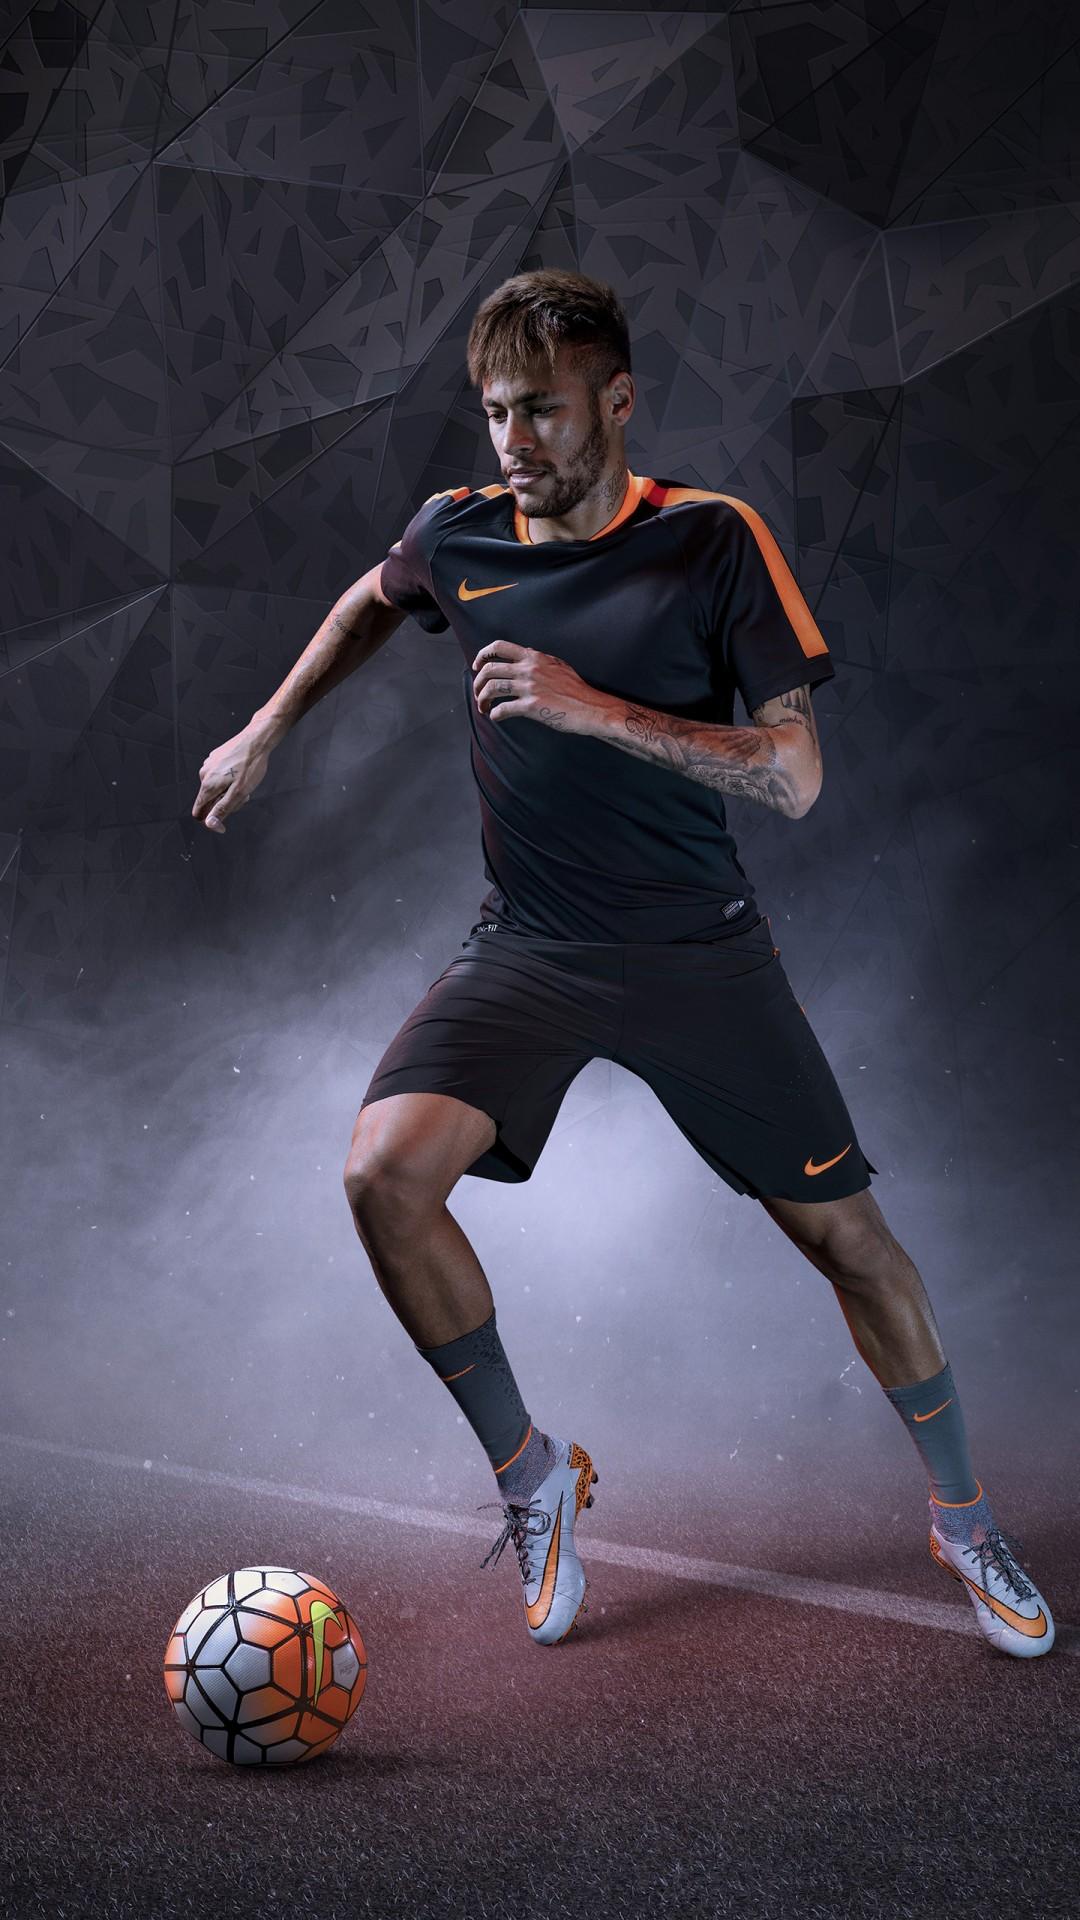 Real Madrid Iphone X Wallpaper Neymar 4k 8k Wallpapers Hd Wallpapers Id 27165